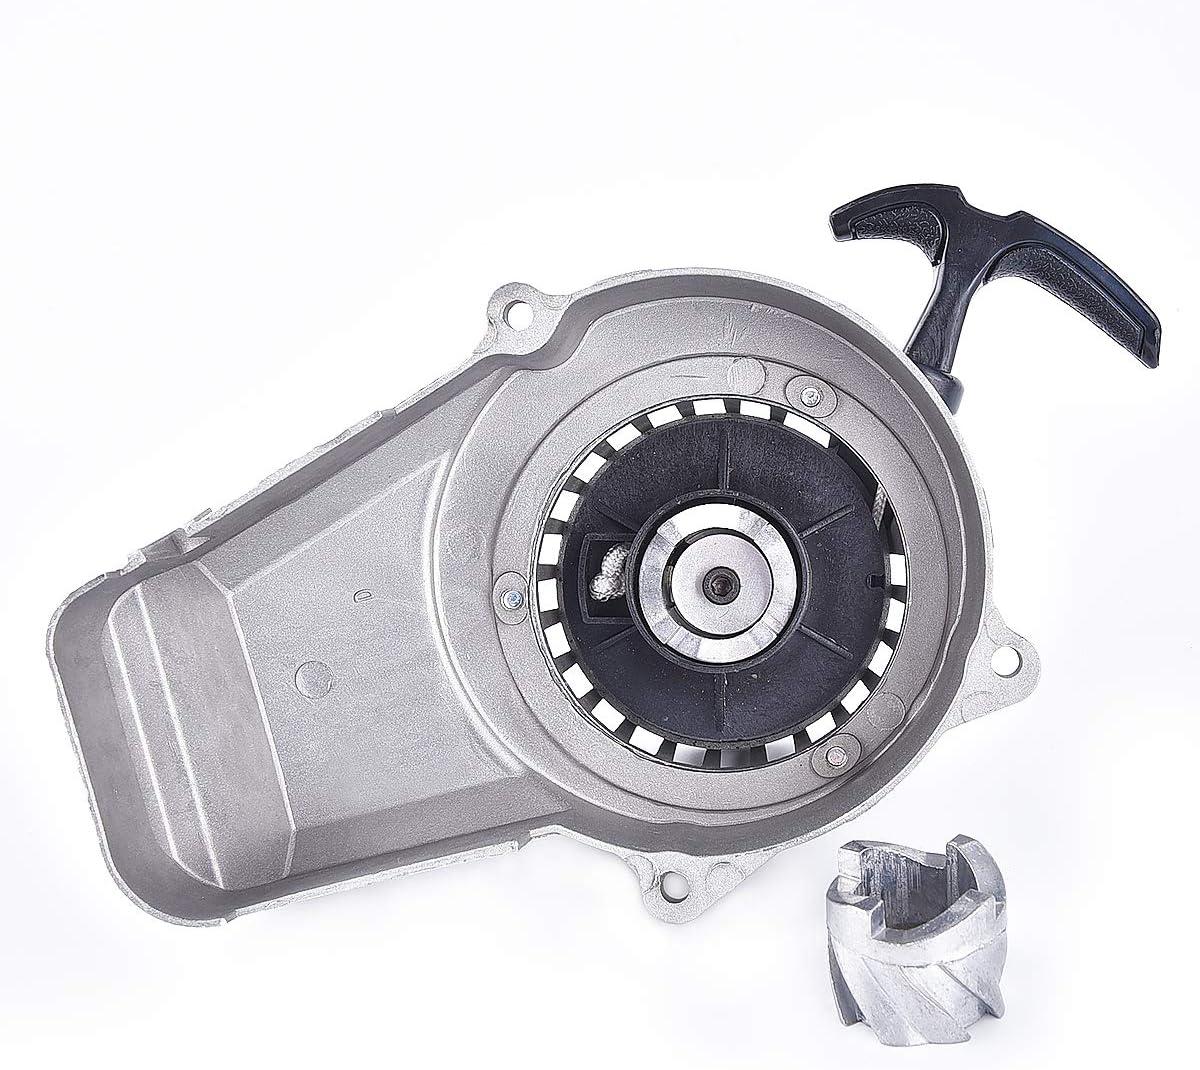 Aluminum Pull Start Starter Recoil 47 49cc Claw Mini Pocket Bike Quad ATV Metal